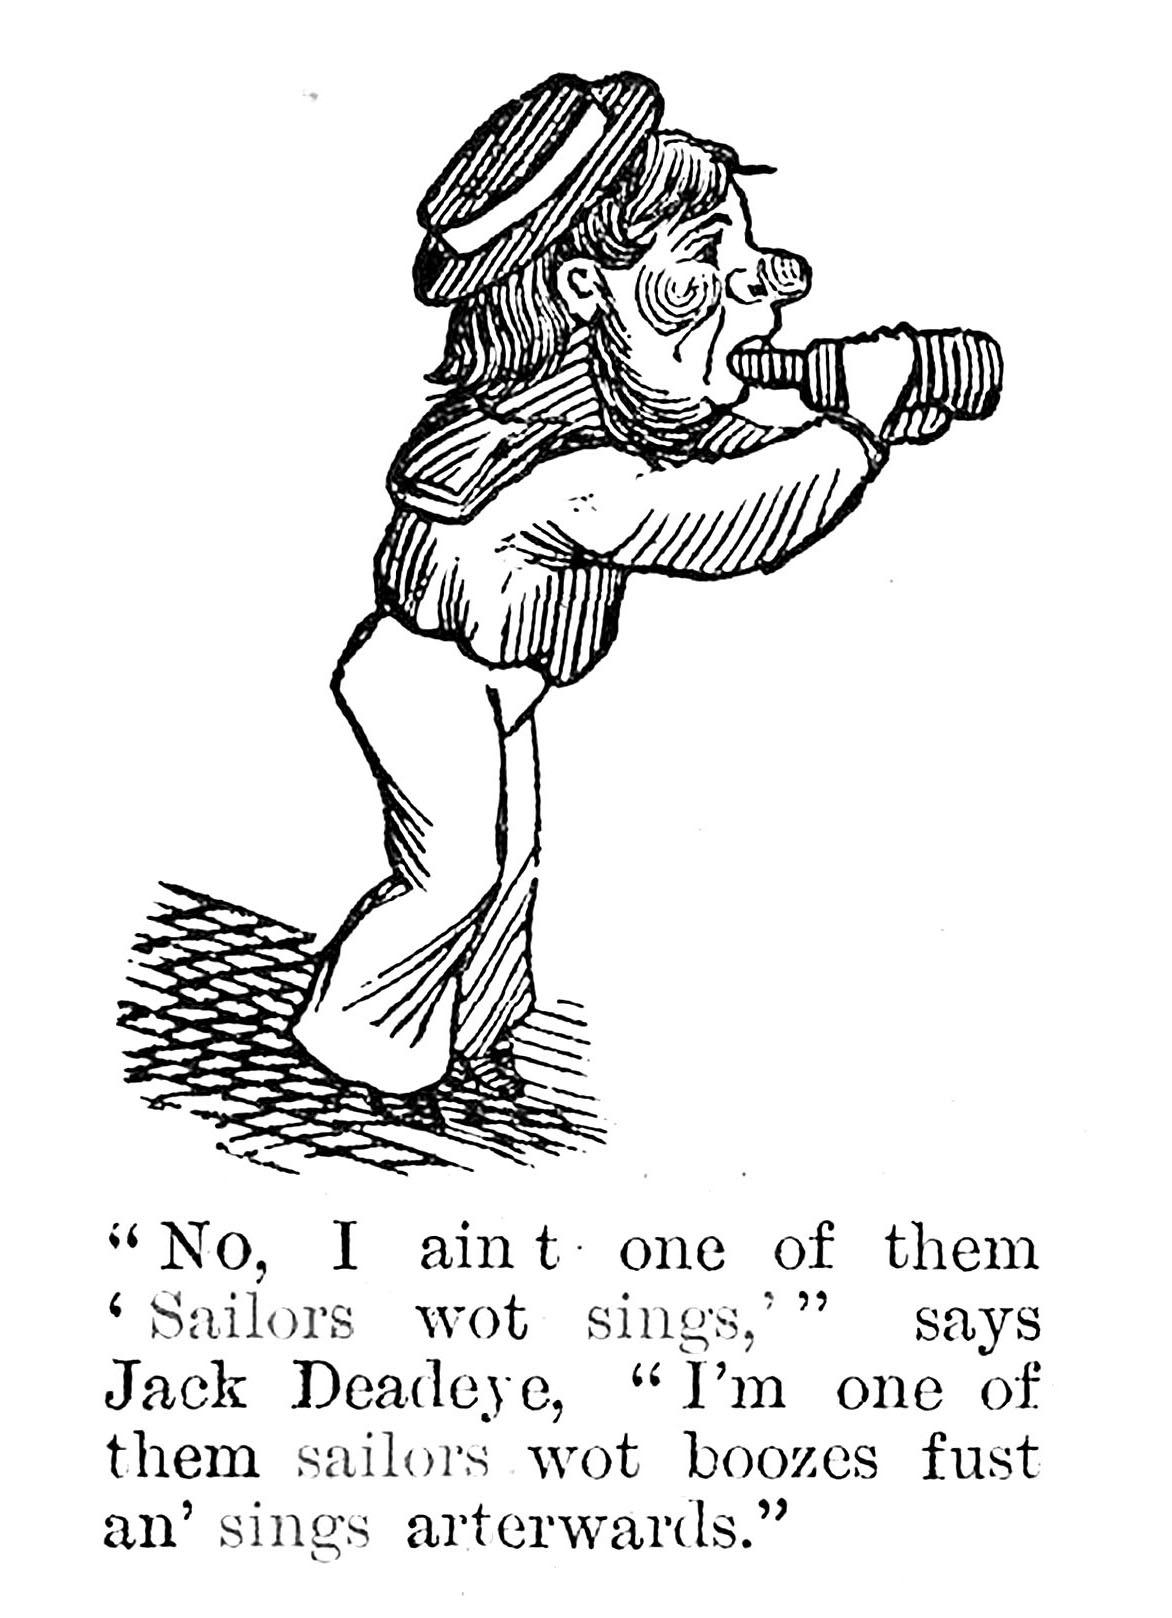 Detail from cartoon in Sydney Punch, 9 June 1888